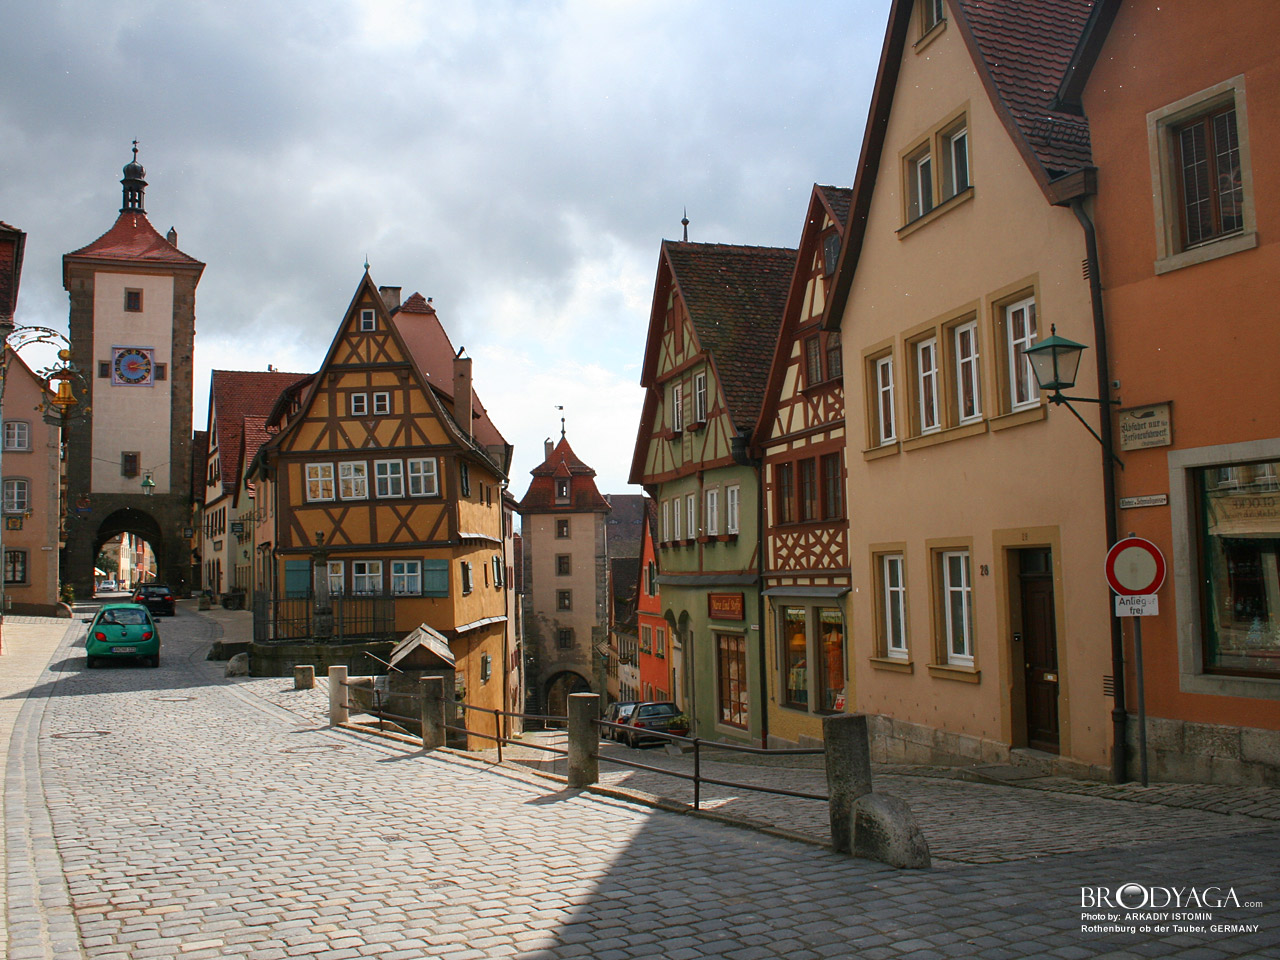 rothenburg ob der tauber beautiful town travel and tourism. Black Bedroom Furniture Sets. Home Design Ideas